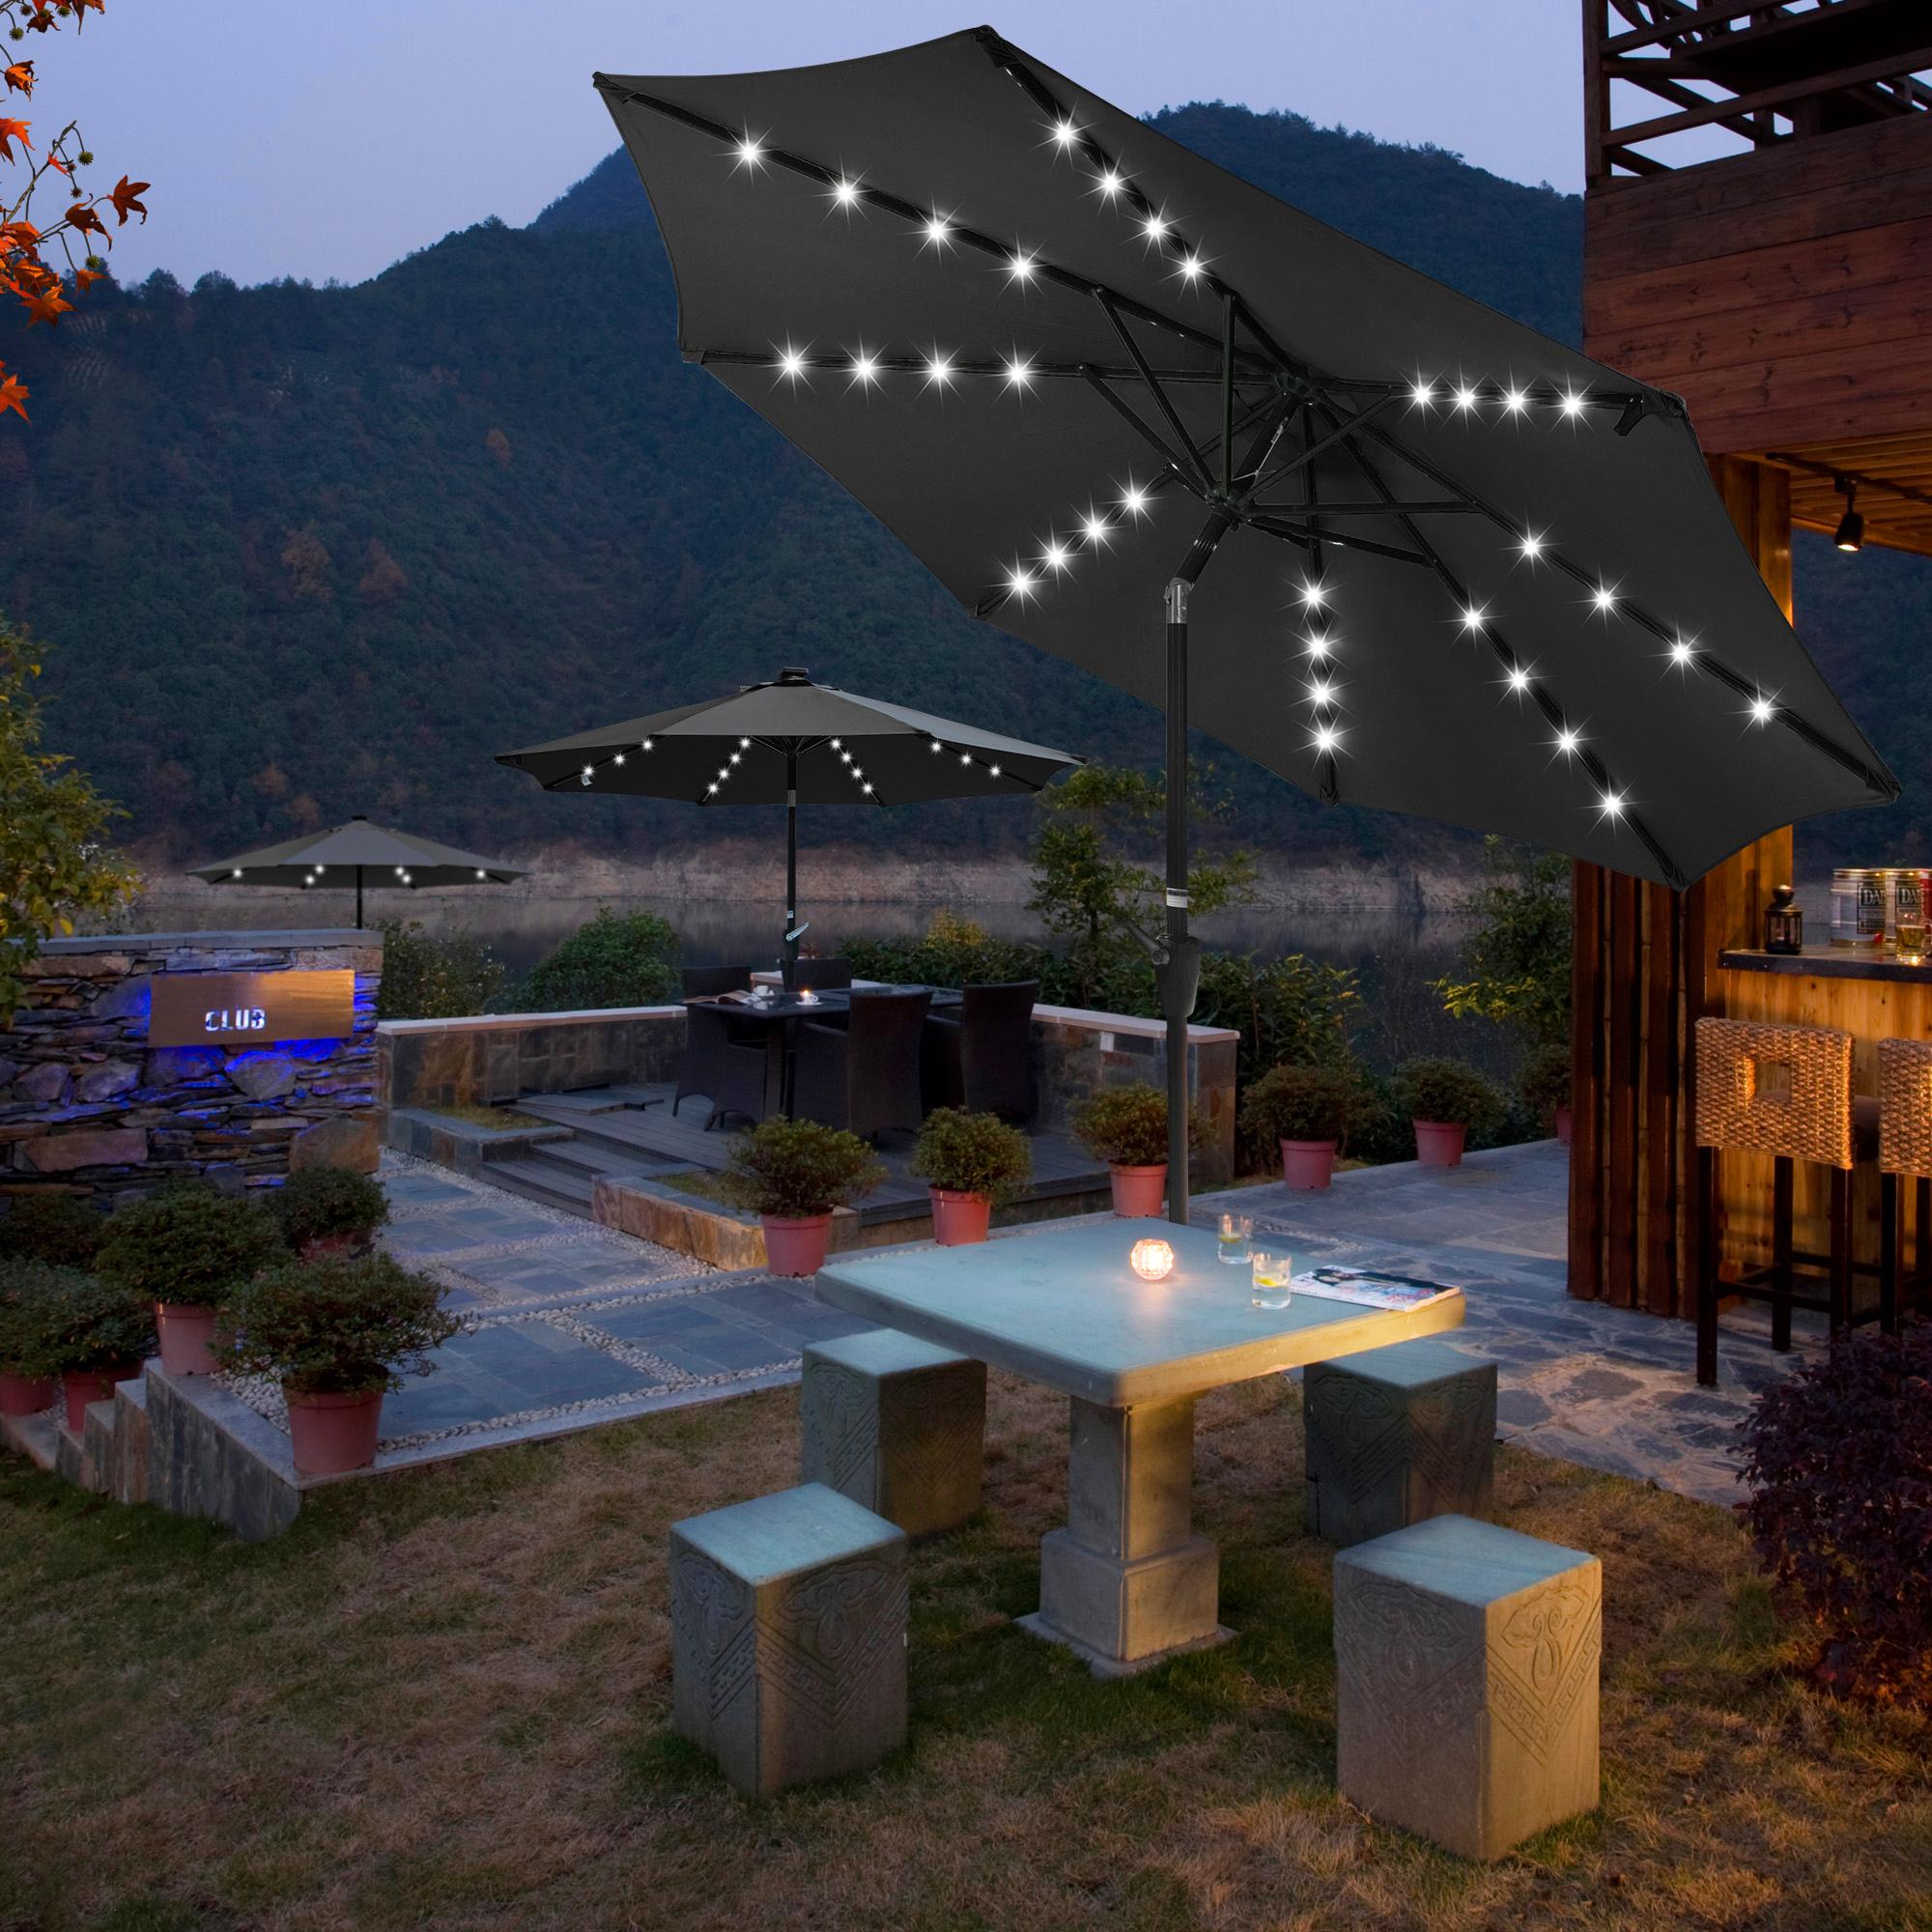 thumbnail 33 - 9' Patio Outdoor Umbrella Solar LED 8 Rib Garden Parasol Yard Deck Table Shade